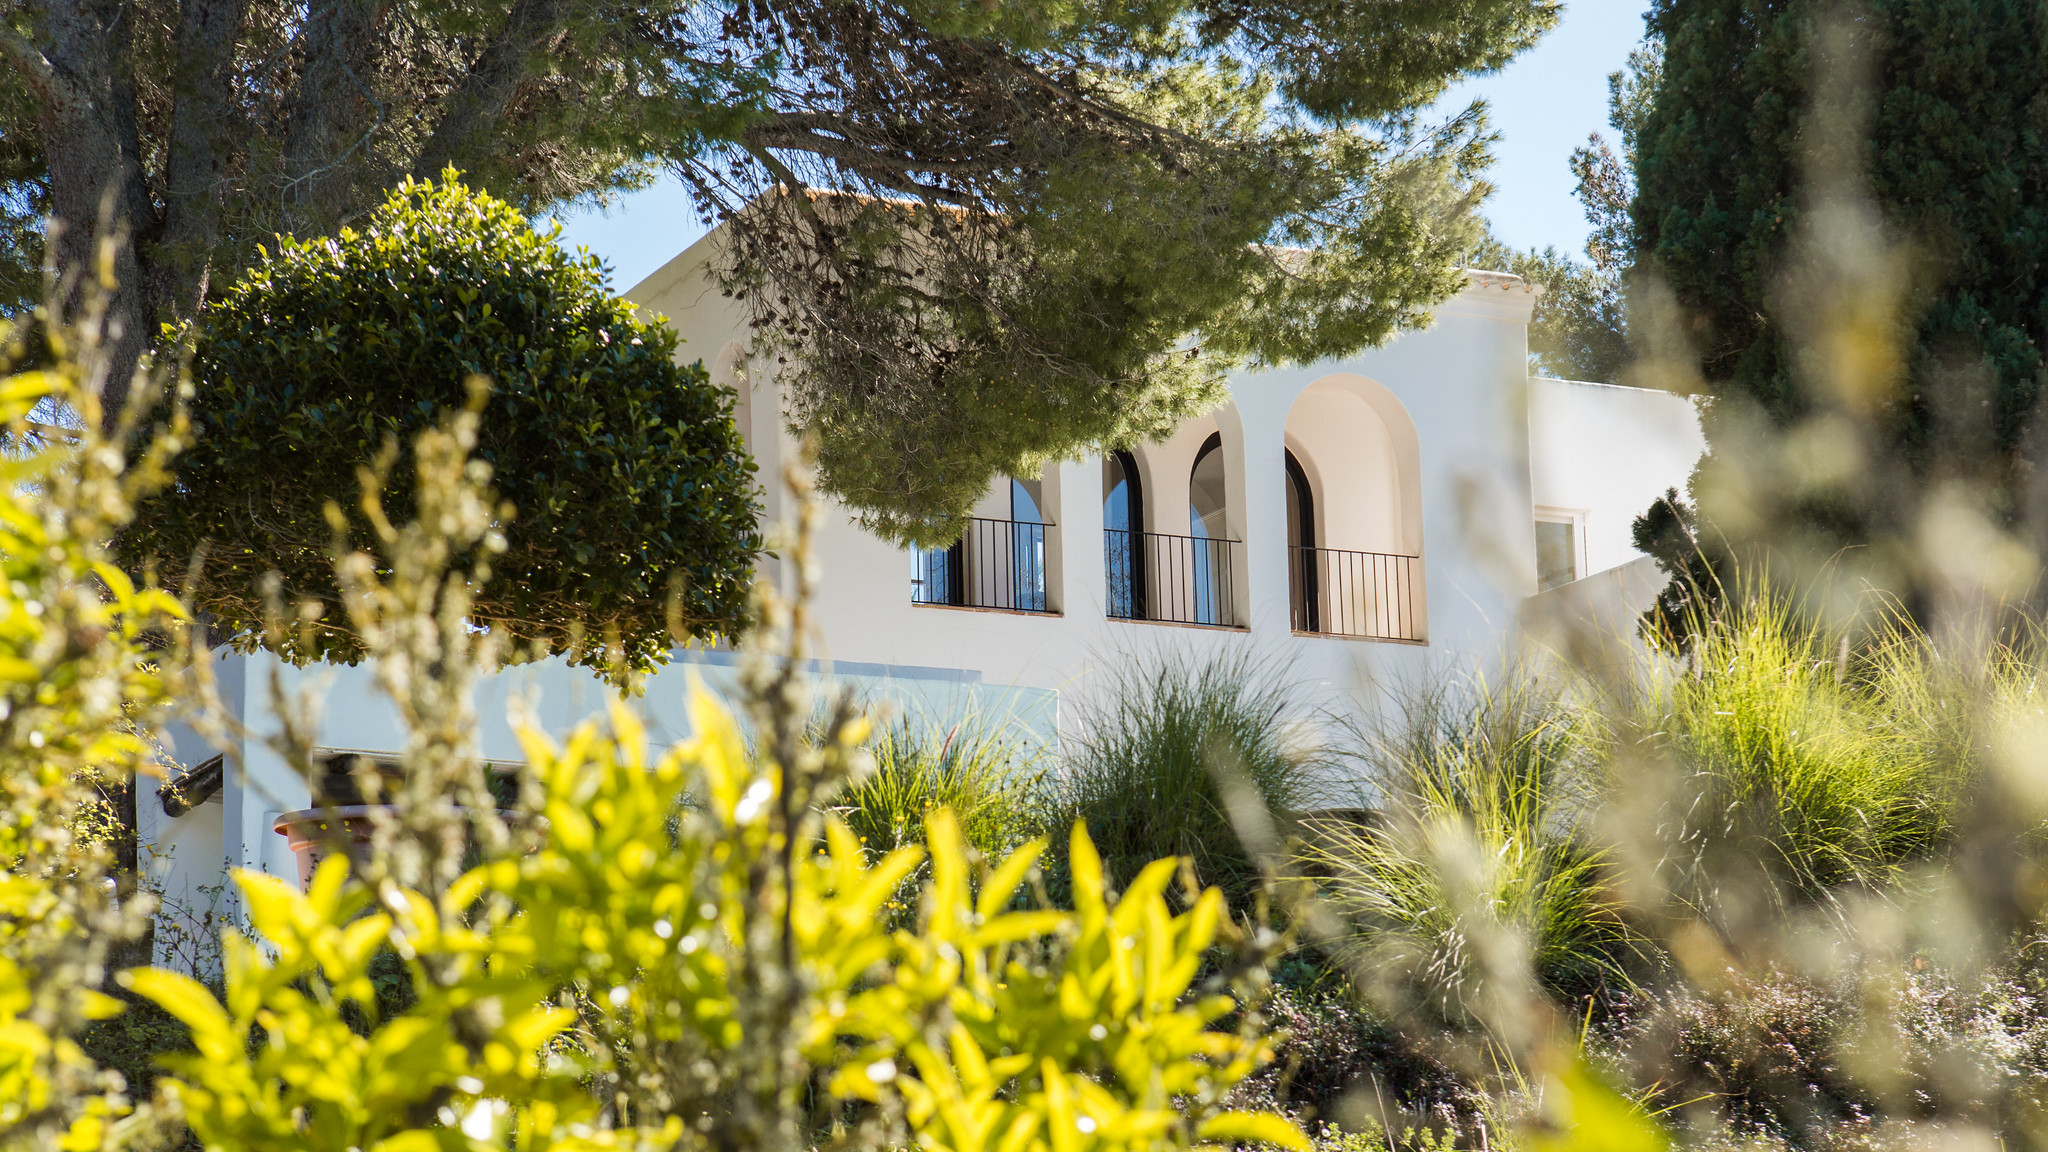 https://www.white-ibiza.com/wp-content/uploads/2020/05/white-ibiza-villas-can-amelida-exterior-house-trees.jpg